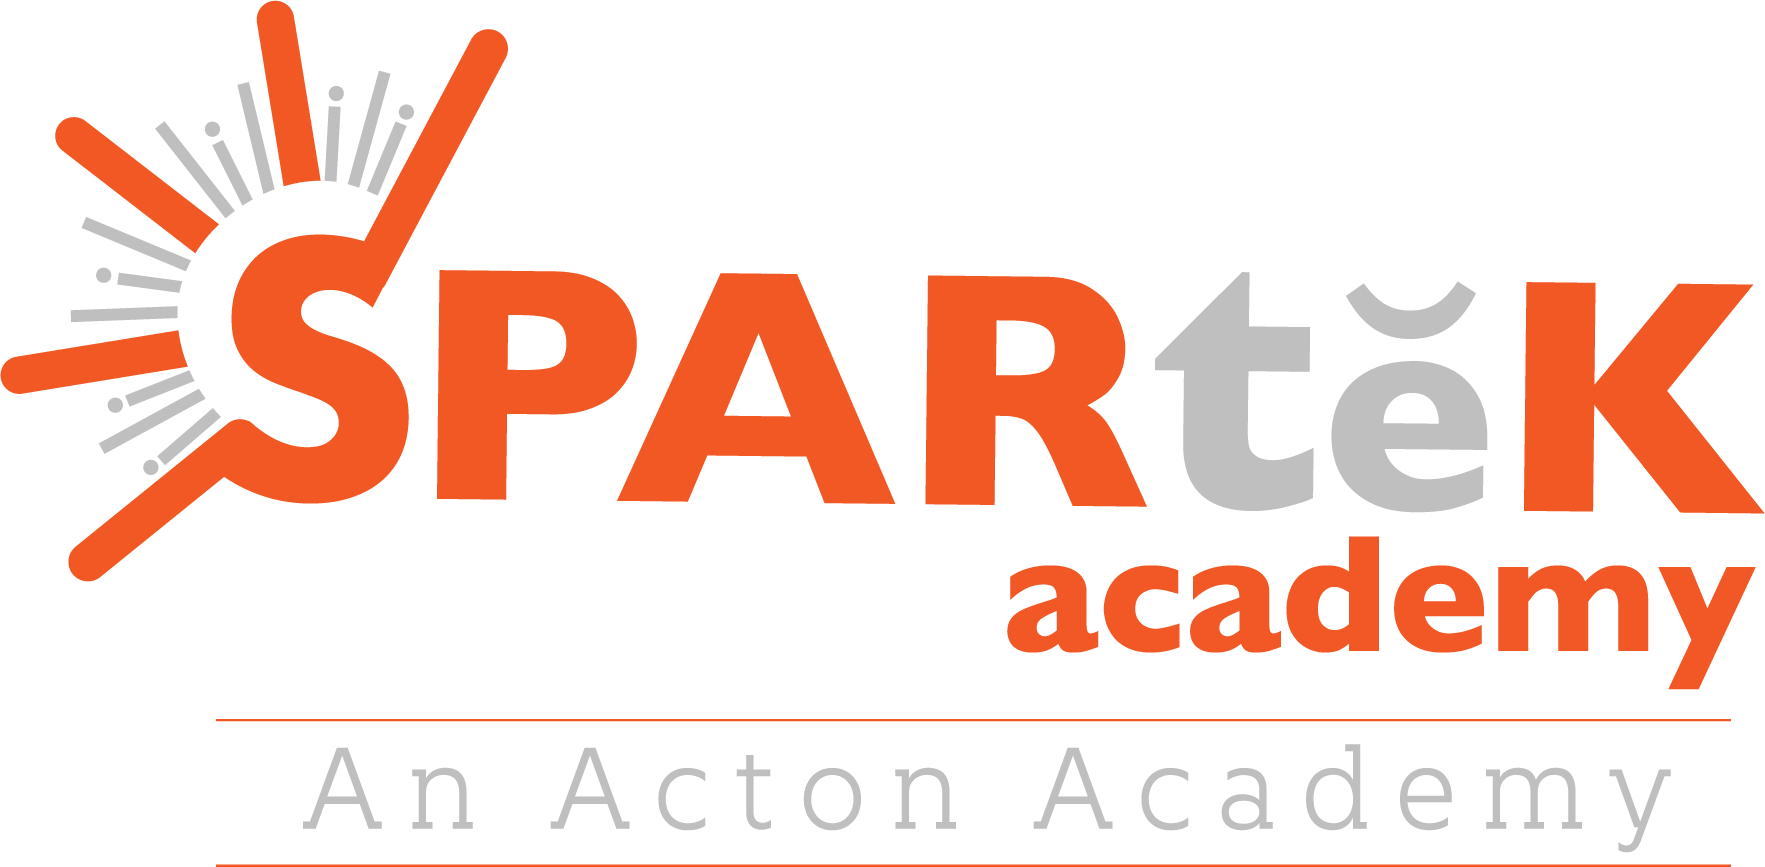 Spartek Academy | An Acton Academy